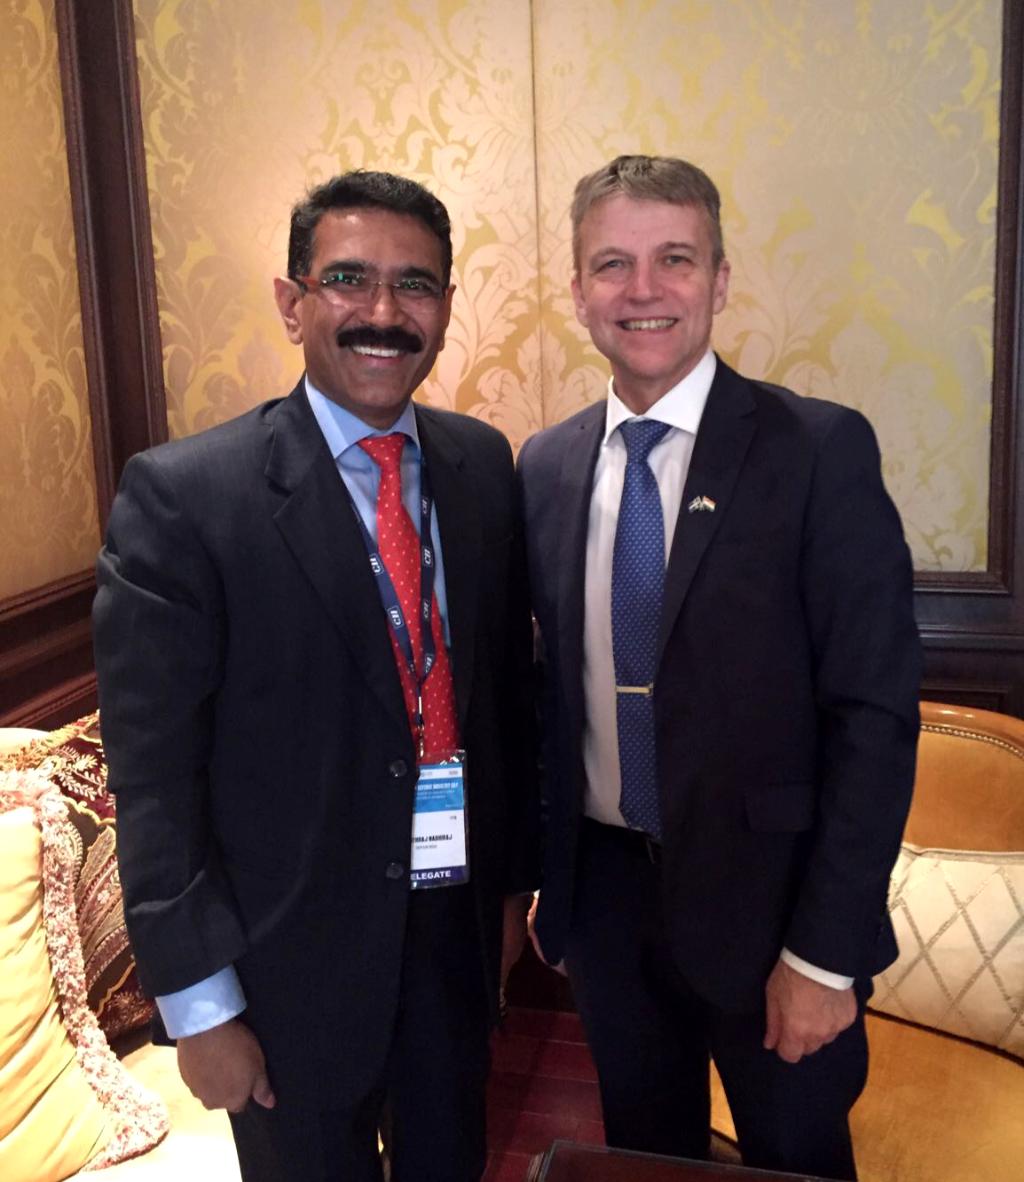 Mr Hardar Nabhiraj Ananthraj (Sepson India Pvt Ltd) and State Secretary for the Swedish Ministry of Defence Mr Jan Salestrand